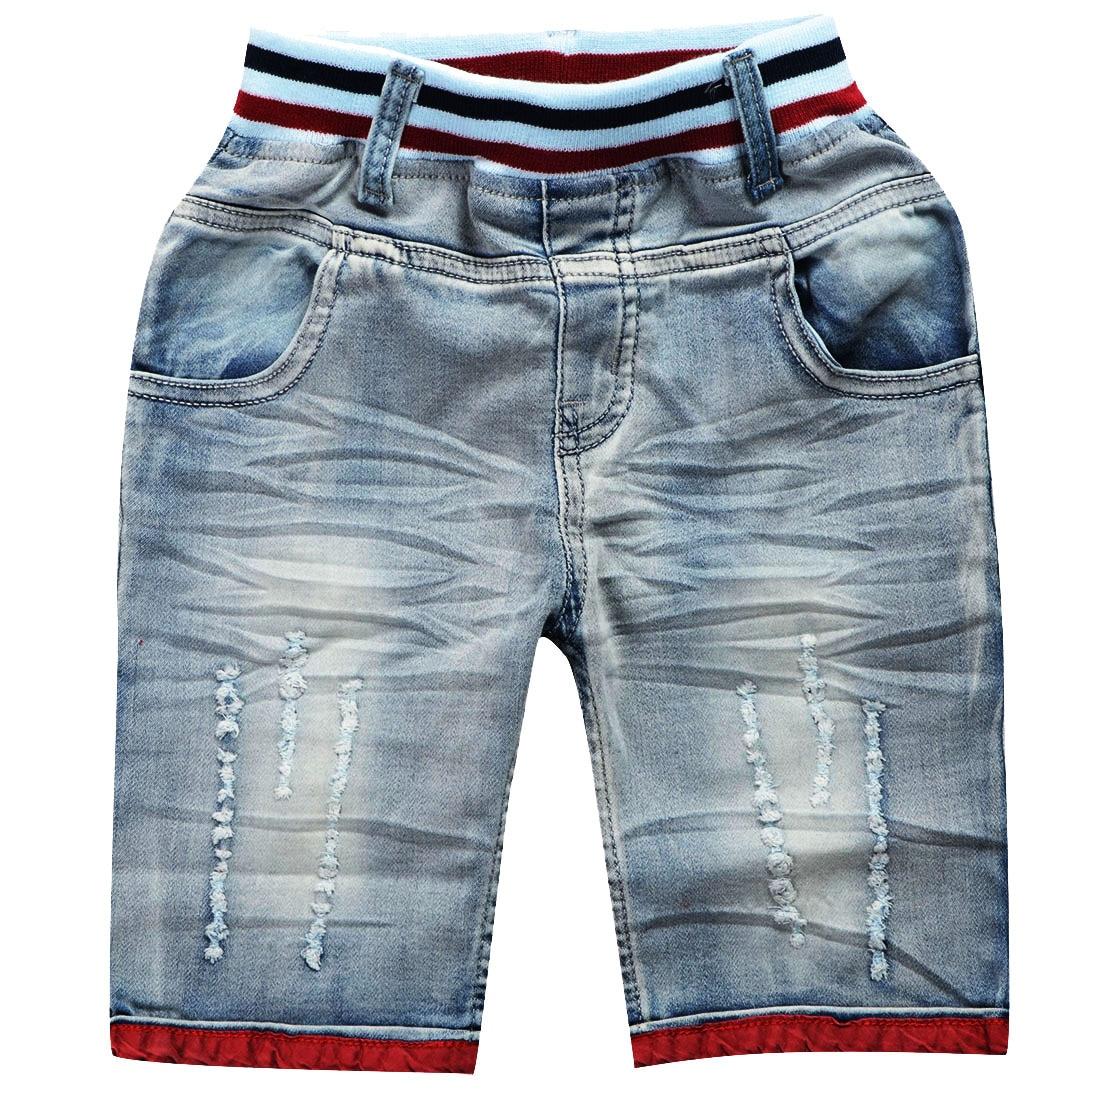 Childrens Unisex Casual Denim-Shorts